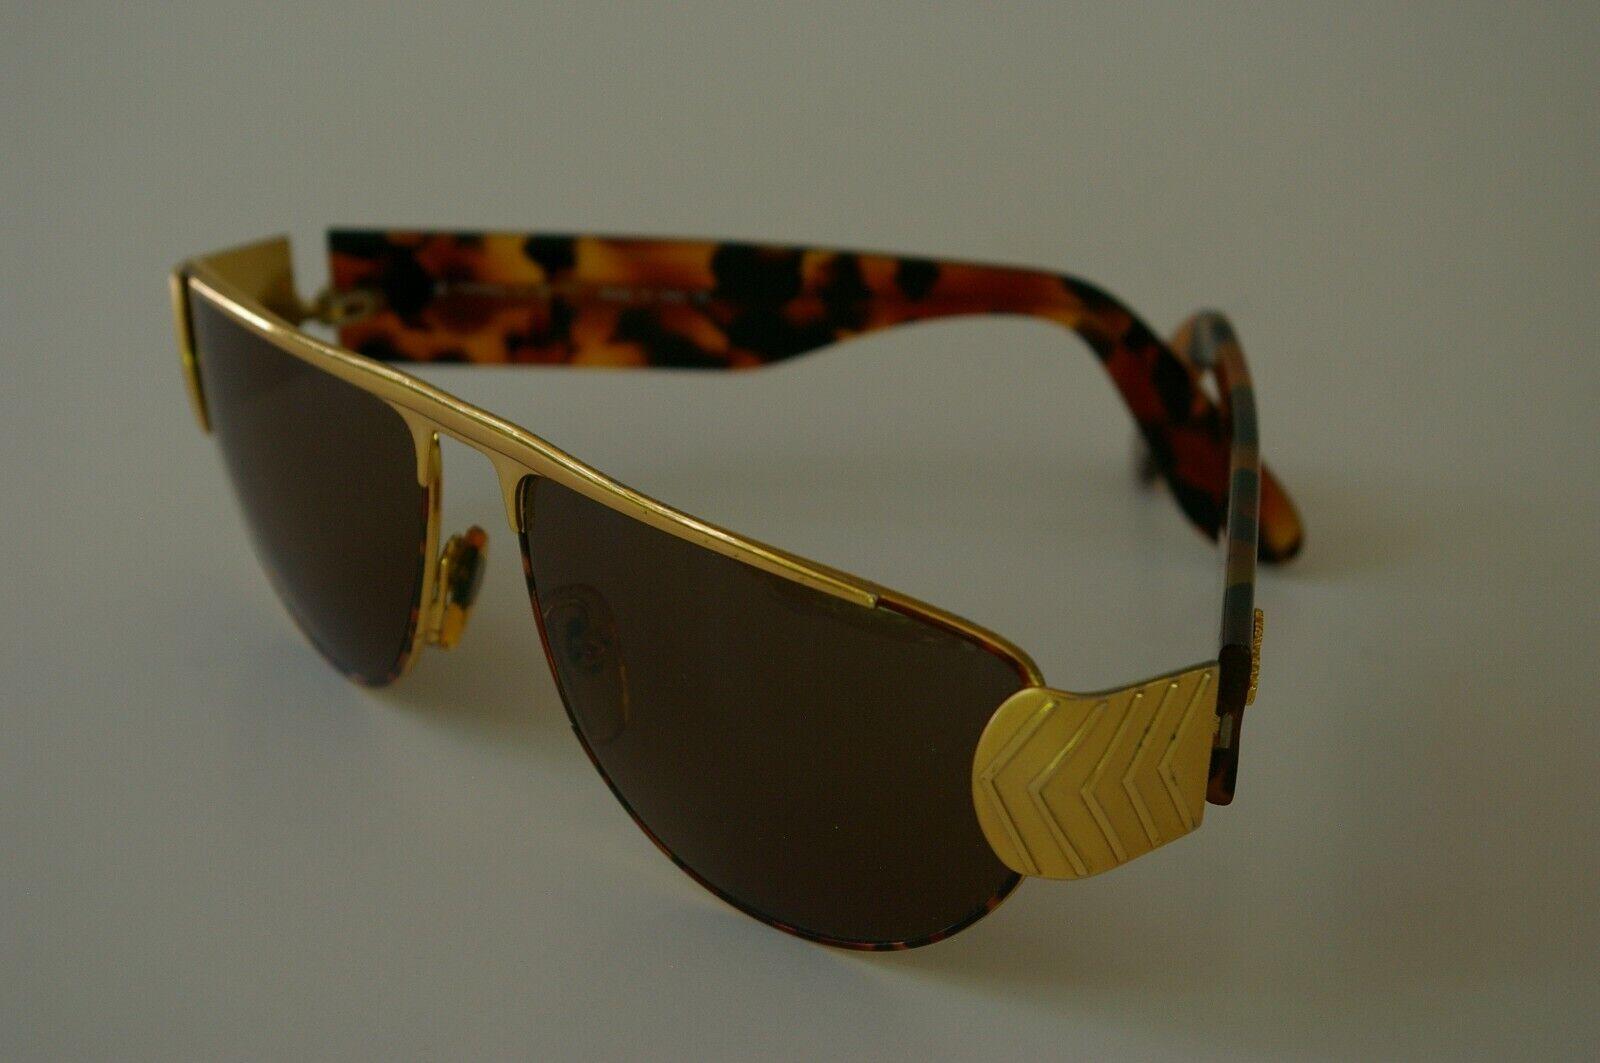 Egon Von Furstenberg Sunglasses MF52 Gold & Tortoise Shell Aviator Vintage Italy